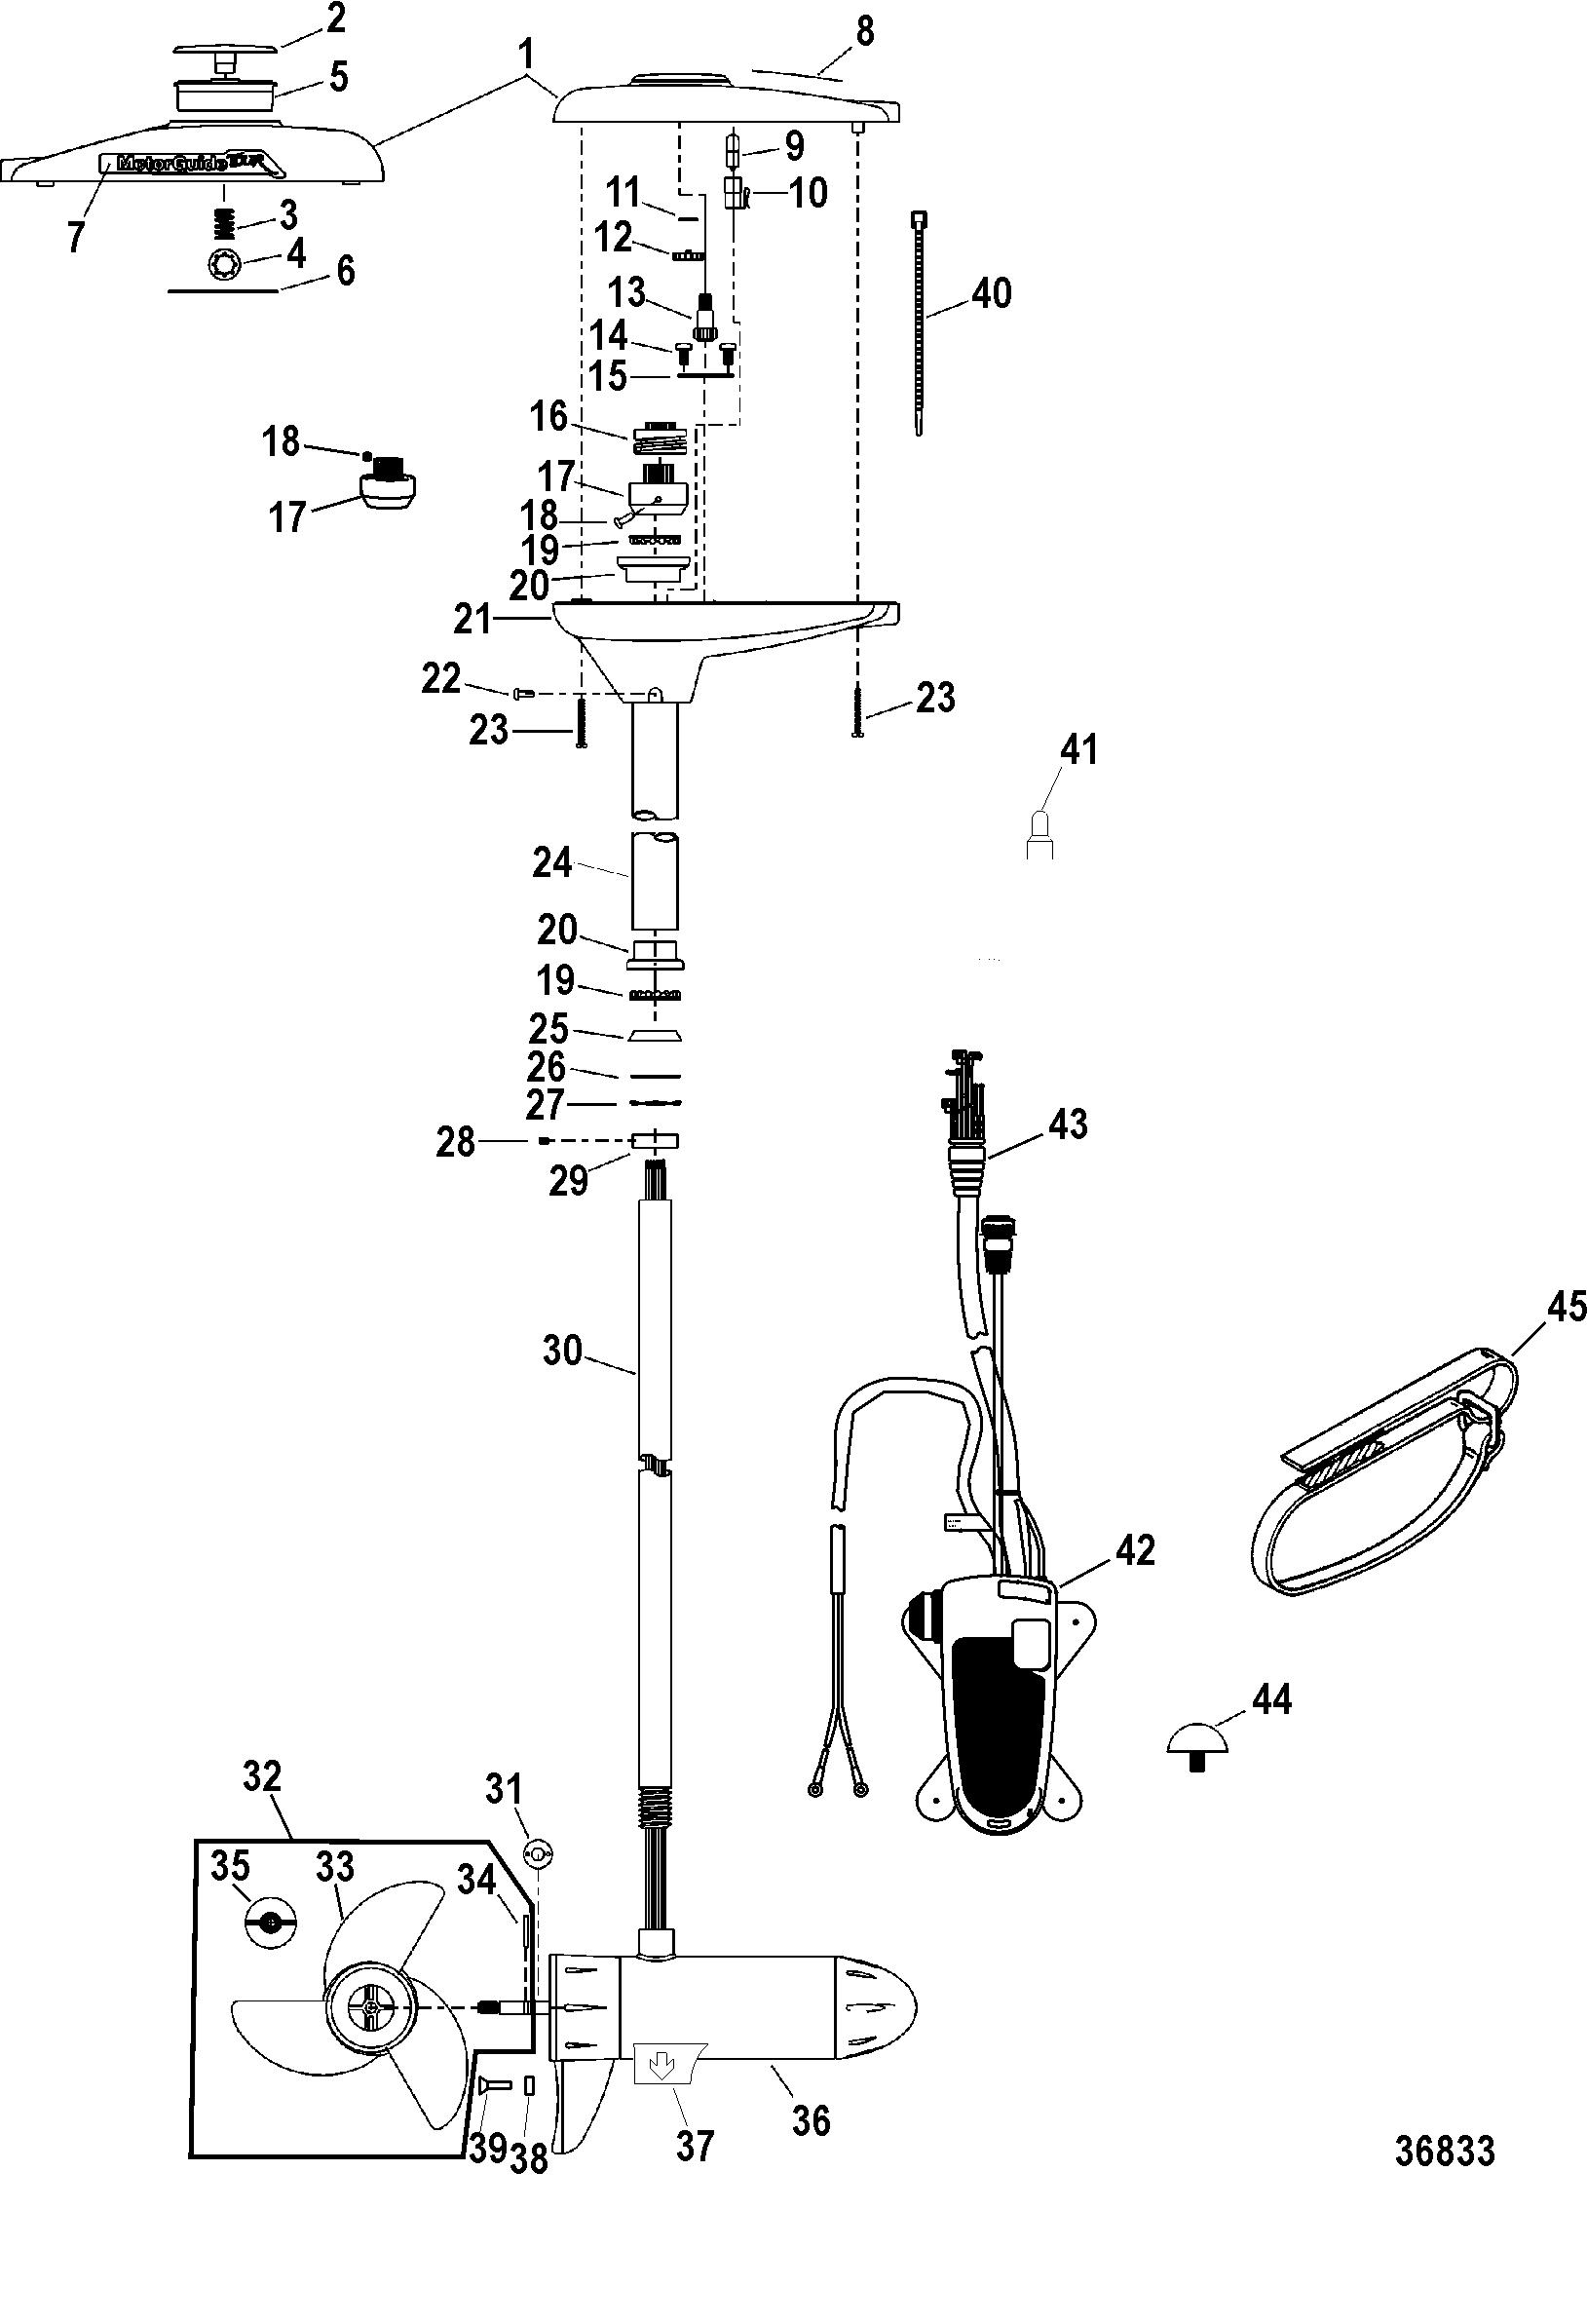 marinco plug wiring diagram vw golf mk1 headlight trolling motor kayak on